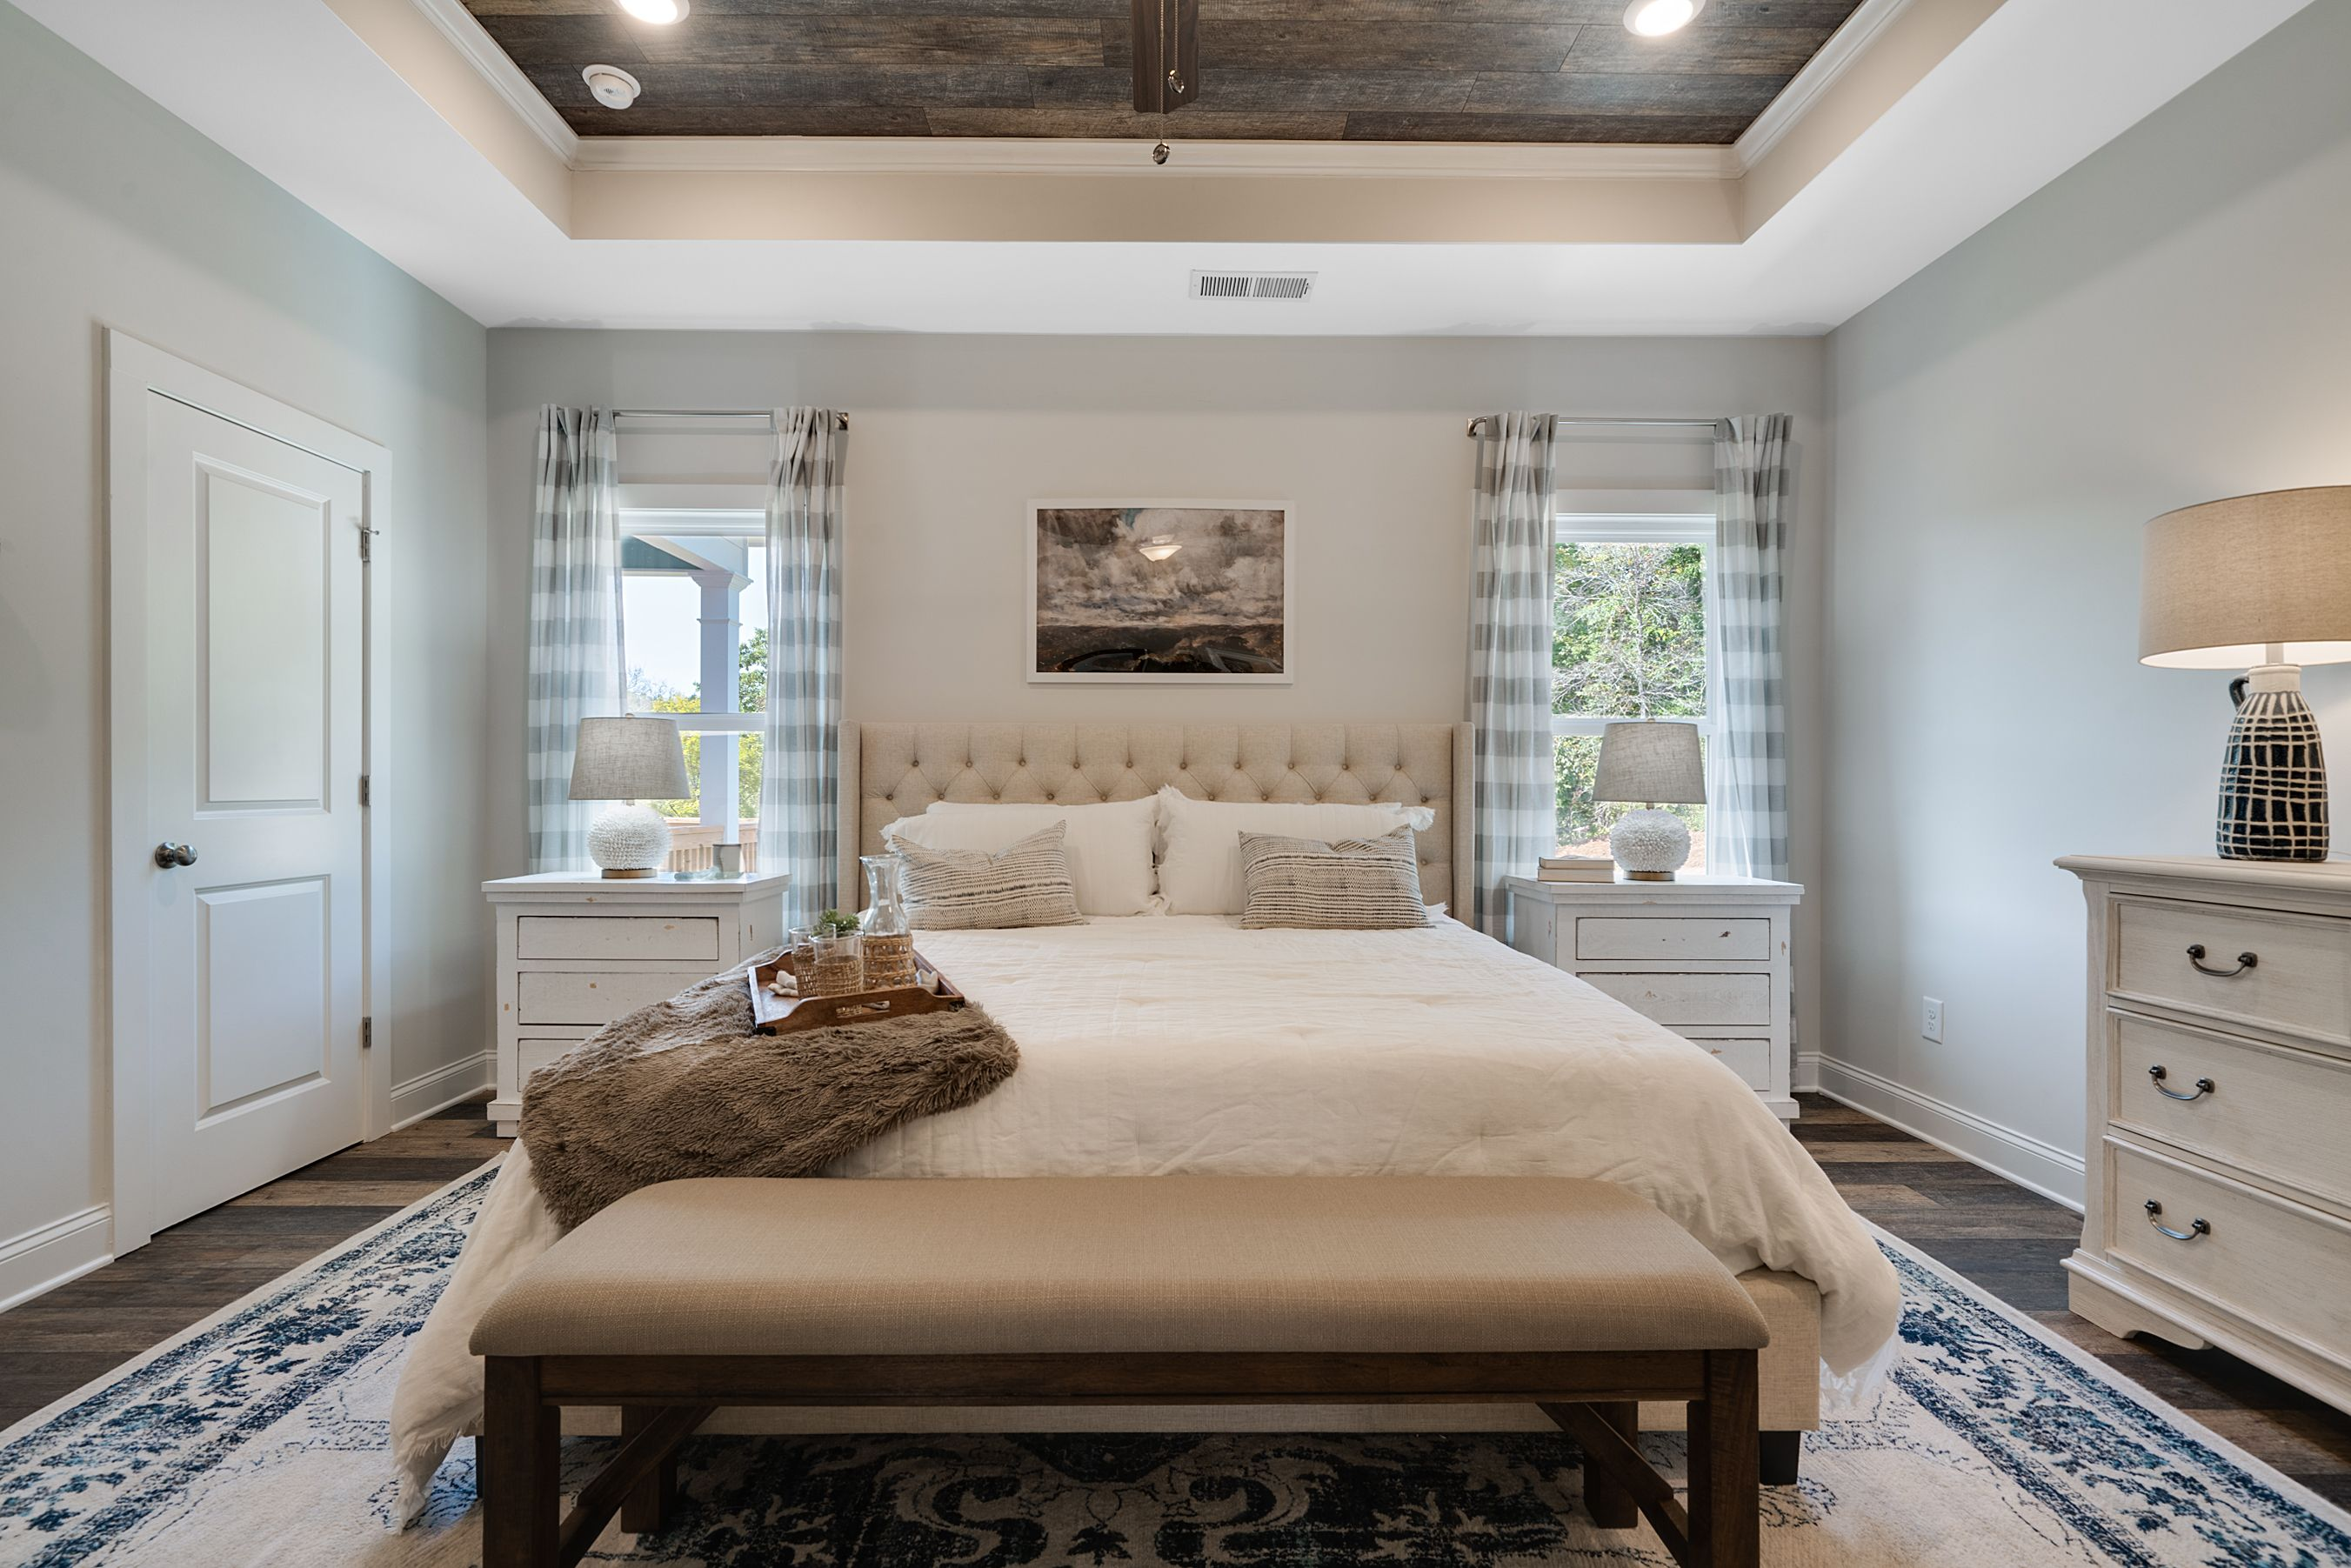 Bedroom featured in the Dalton (Farmhouse Series) By Artisan Built Communities in Atlanta, GA